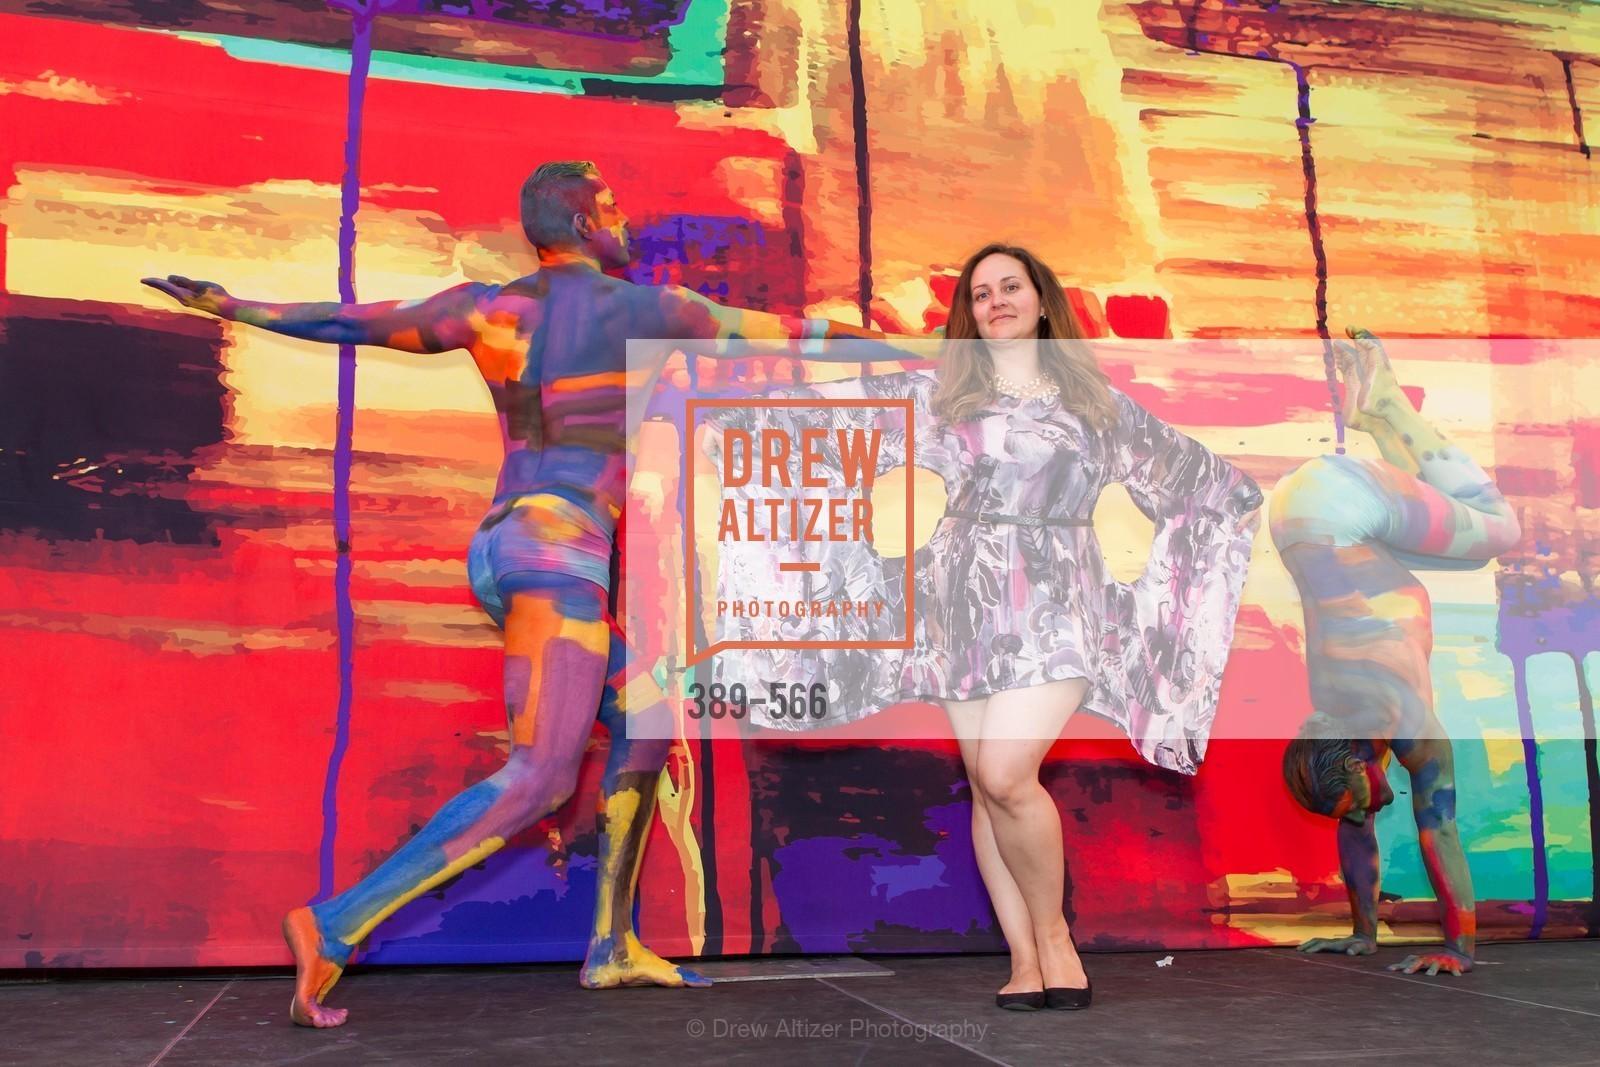 Trina Merry, SAN JOSE MUSEUM OF ART'S Spectrum Gala - 45th Anniversary, US, September 13th, 2014,Drew Altizer, Drew Altizer Photography, full-service agency, private events, San Francisco photographer, photographer california